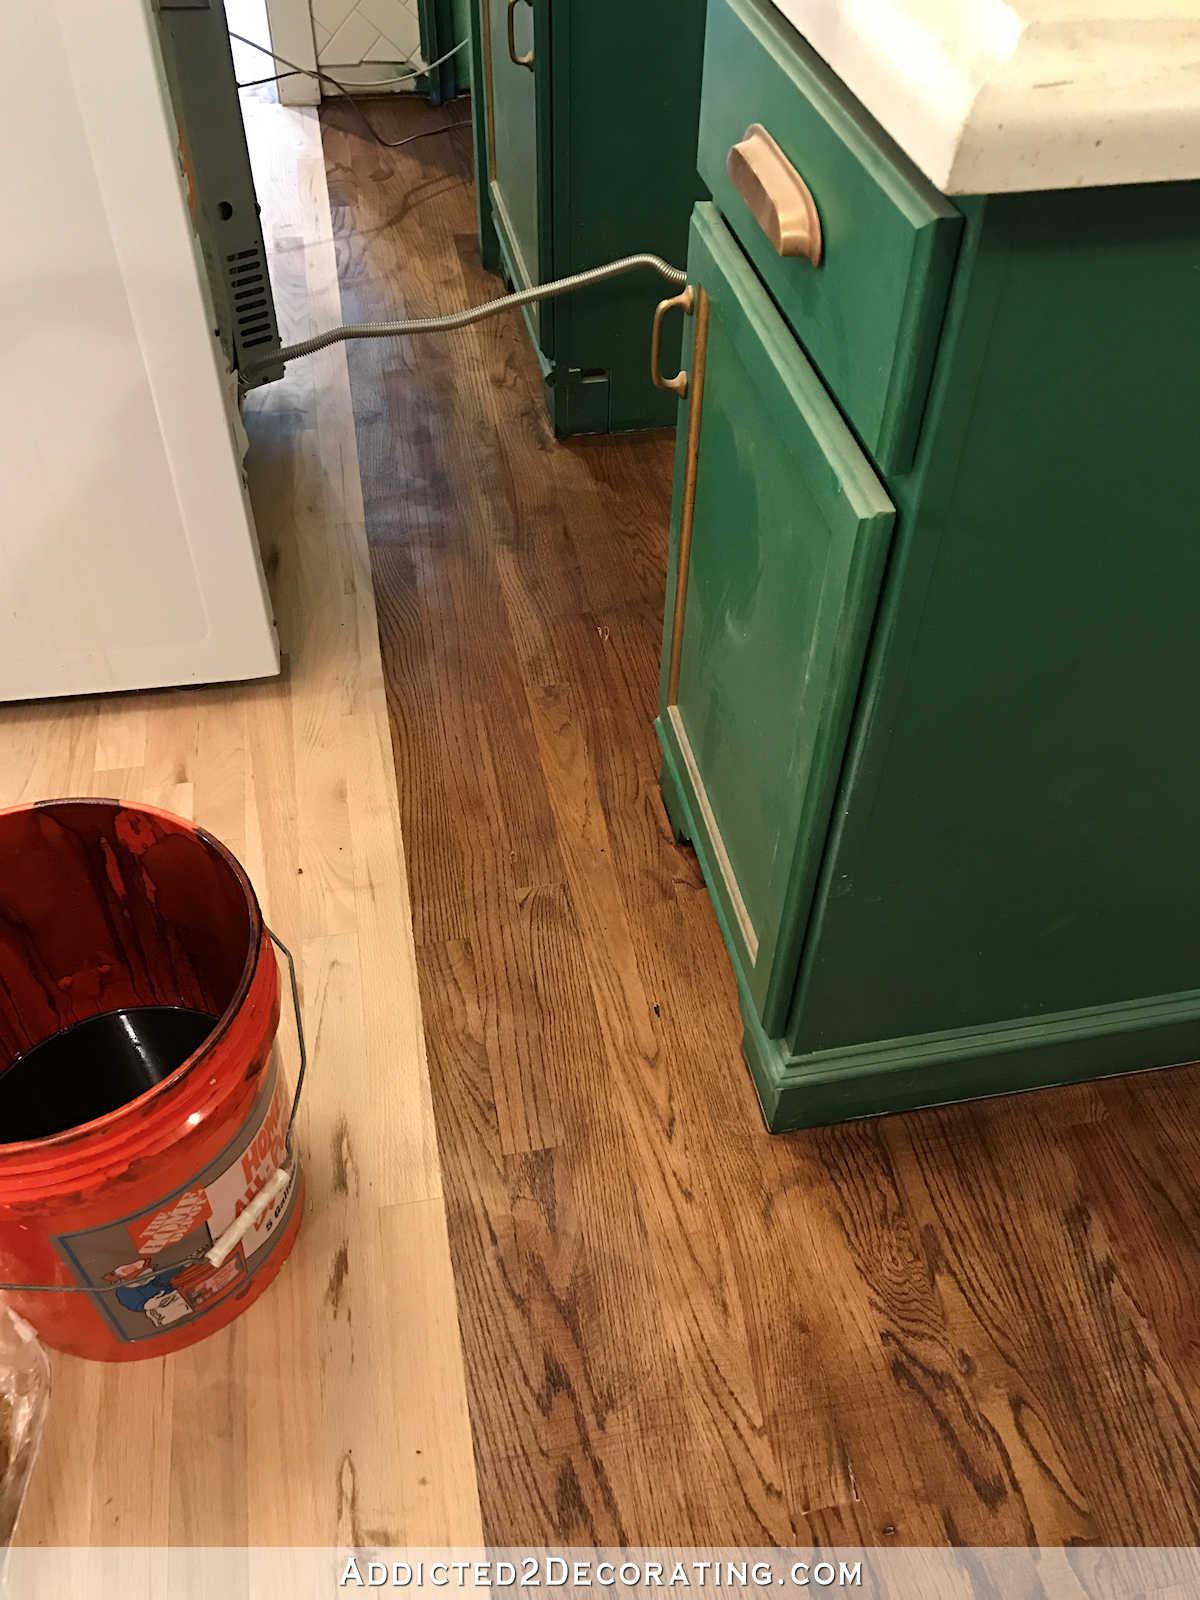 antique oak hardwood flooring of adventures in staining my red oak hardwood floors products process with staining red oak hardwood floors 10 stain on kitchen floor behind stove and refrigerator